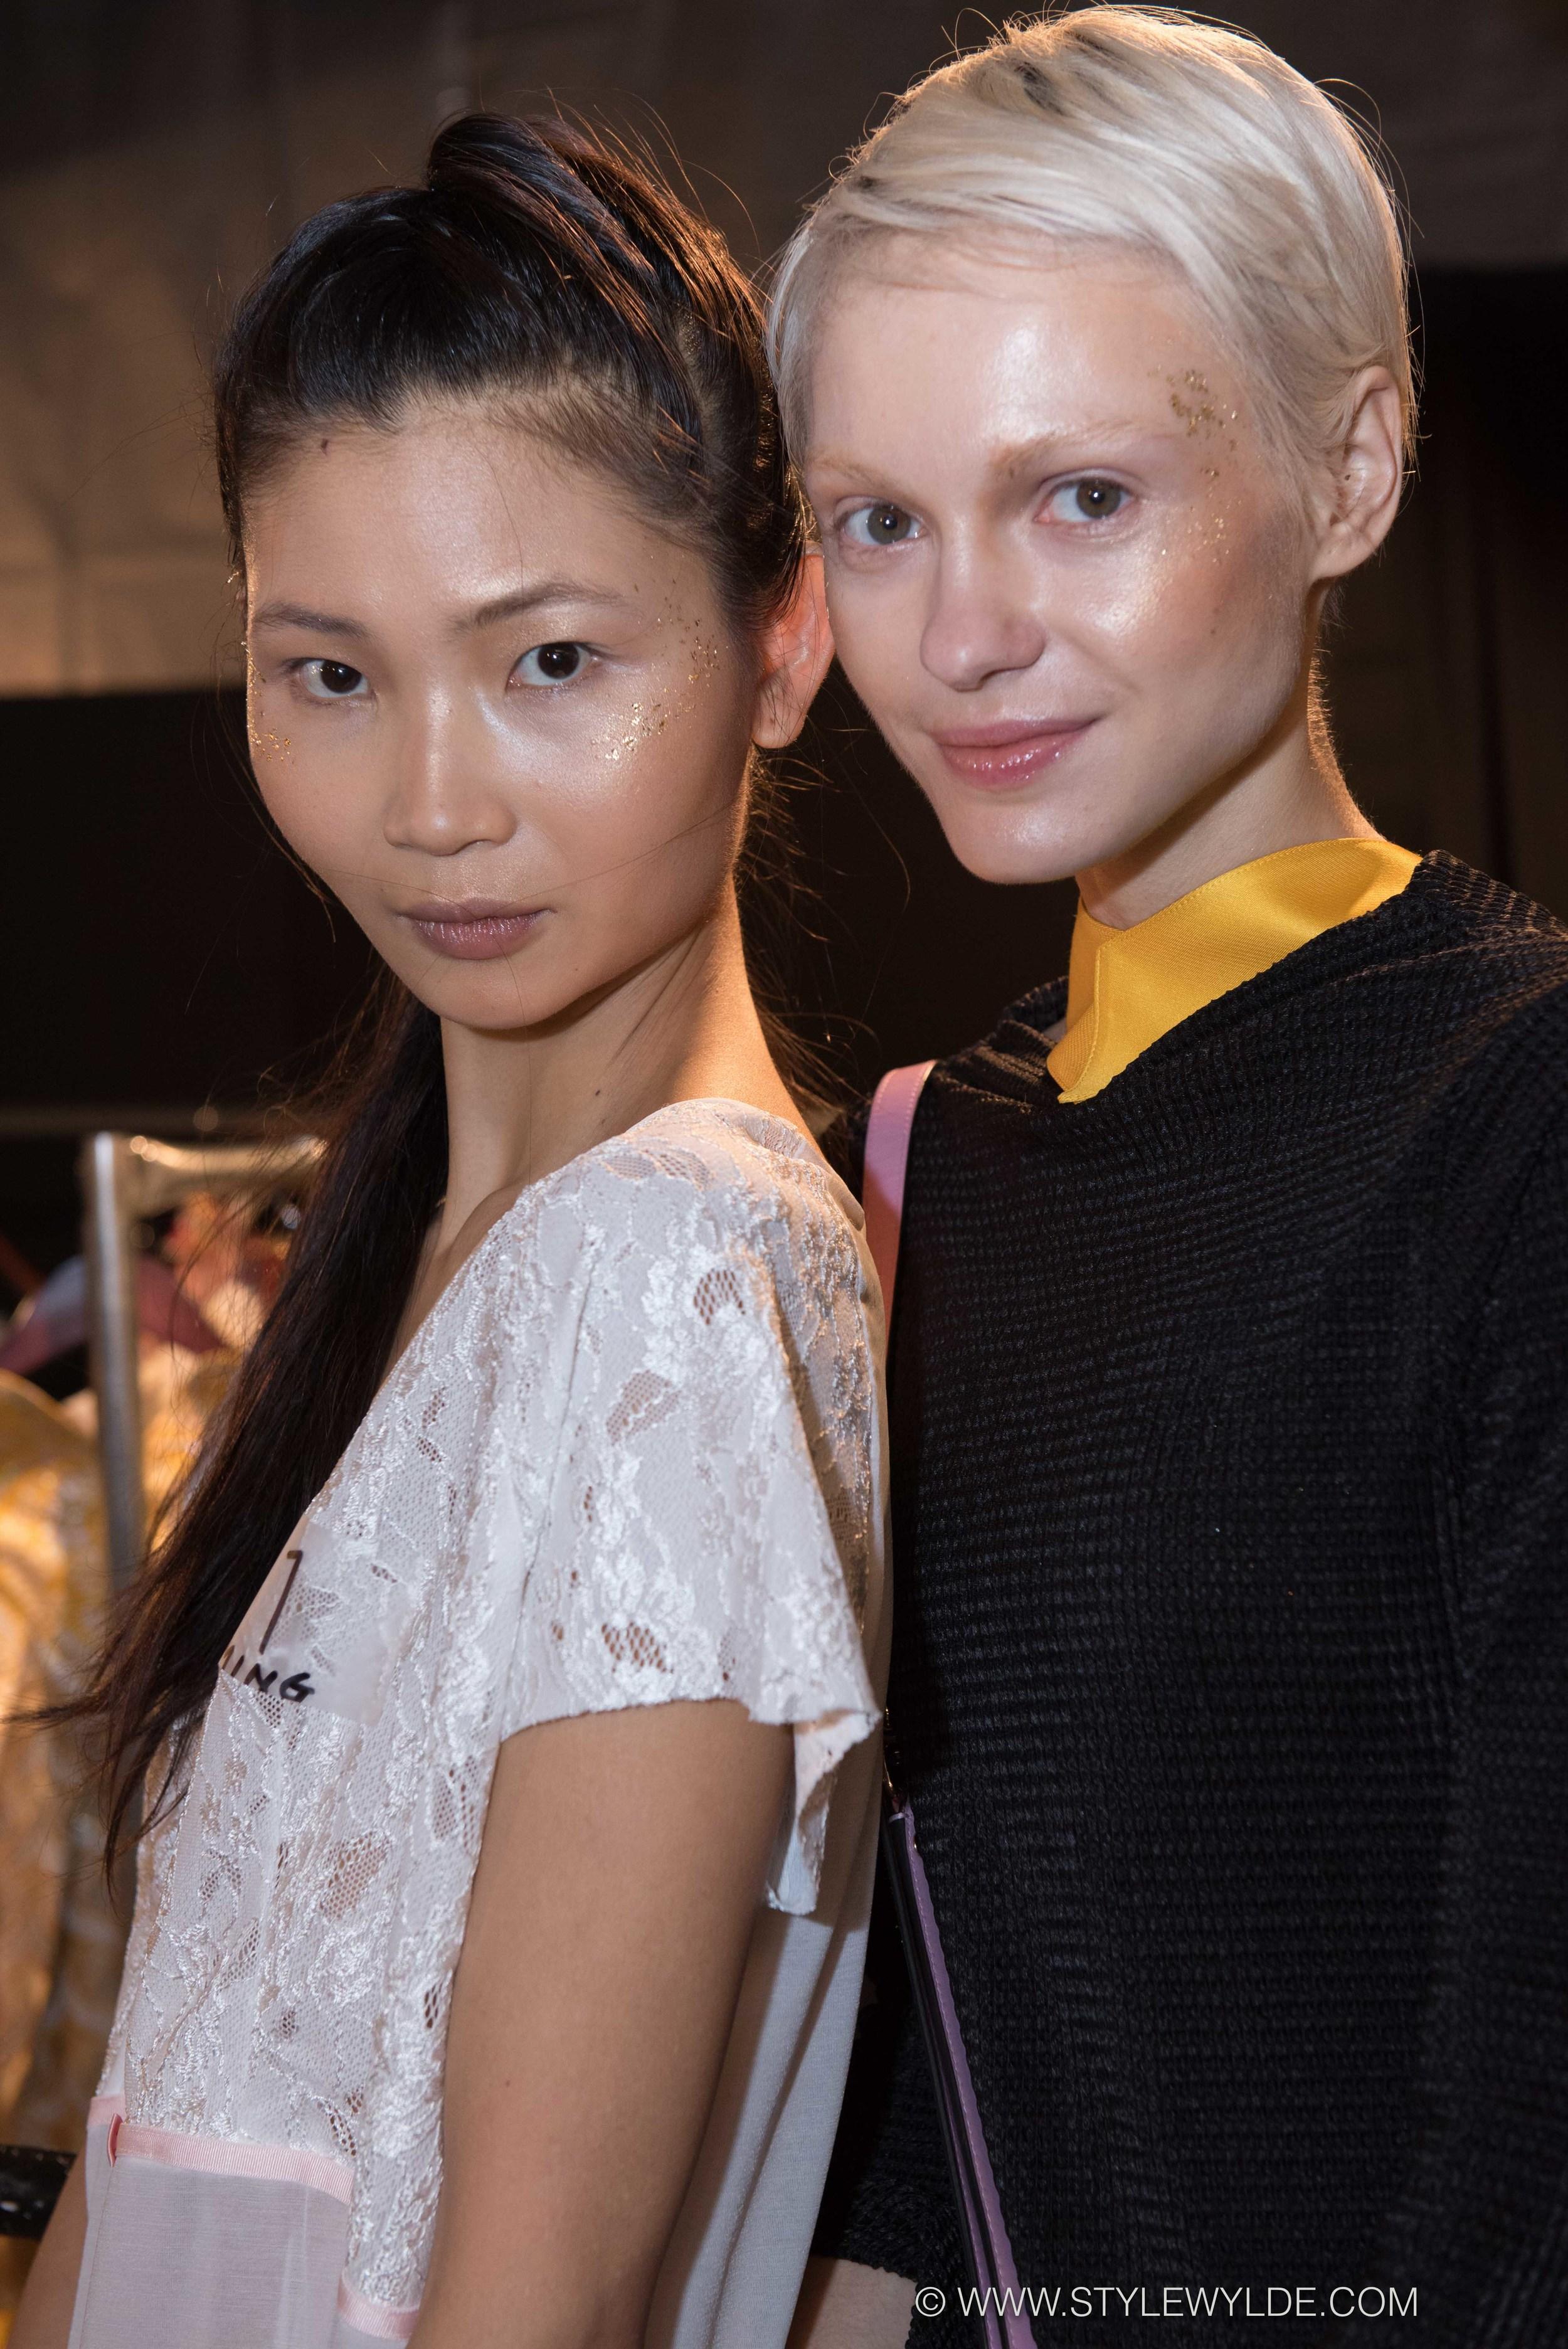 StyleWylde - HIromi Asai- Bkstg-14.jpg